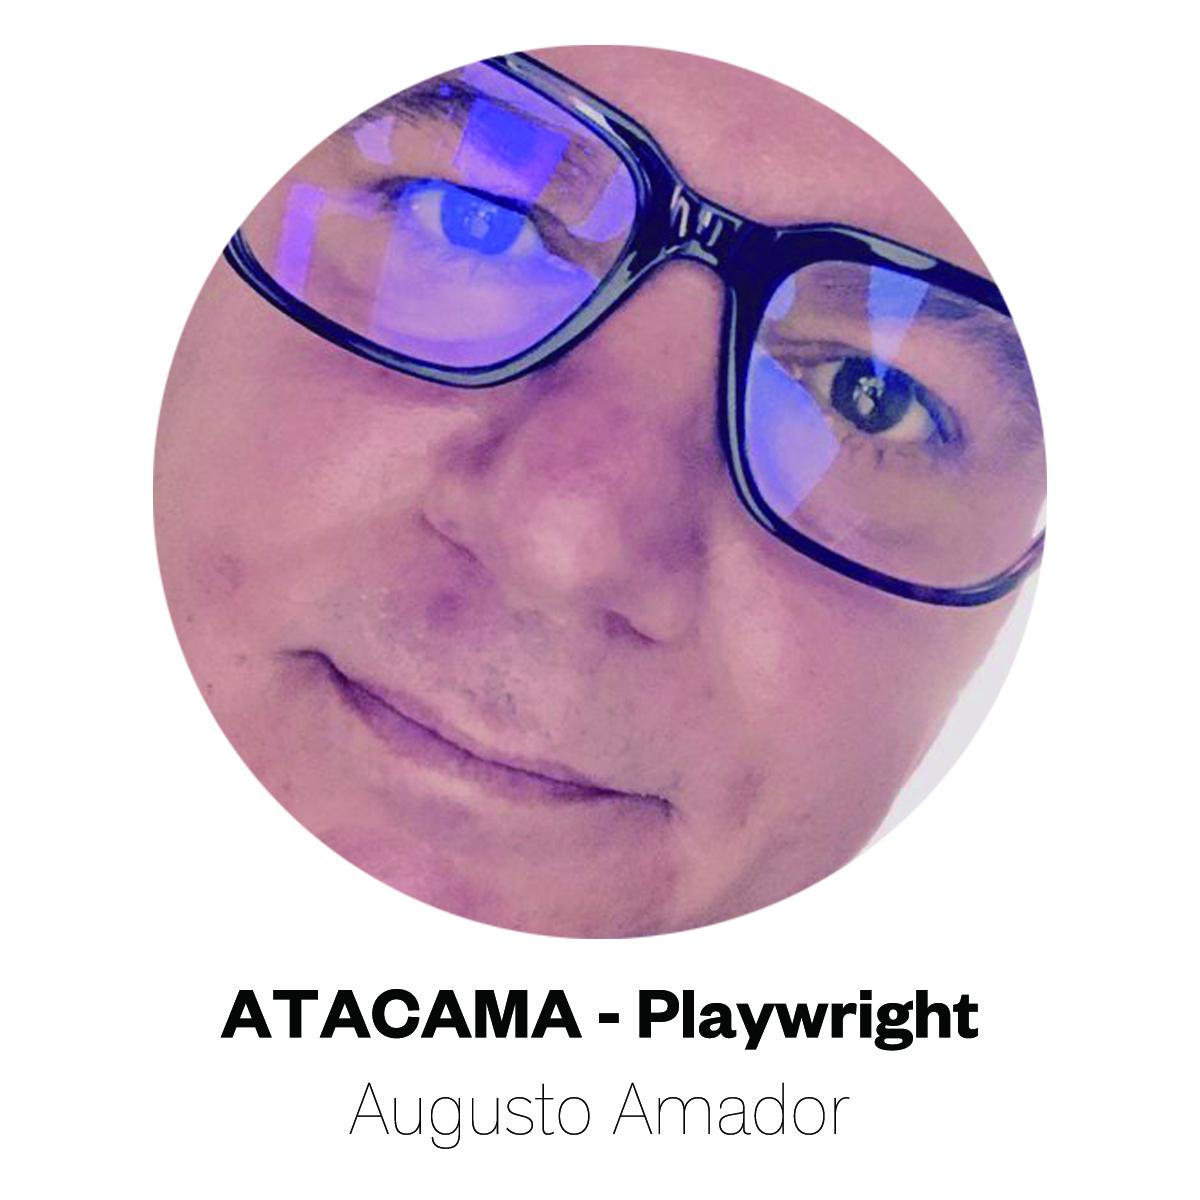 Atacama Playwright Augusto Amador